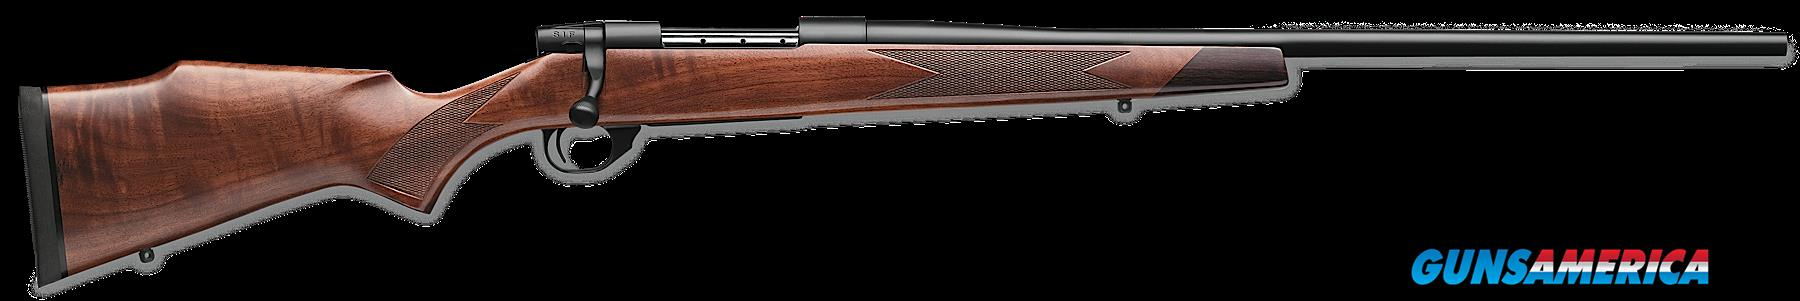 Weatherby Vanguard, Wthby Vdt270nr4o Vgd 270 Sprtr  Guns > Pistols > 1911 Pistol Copies (non-Colt)